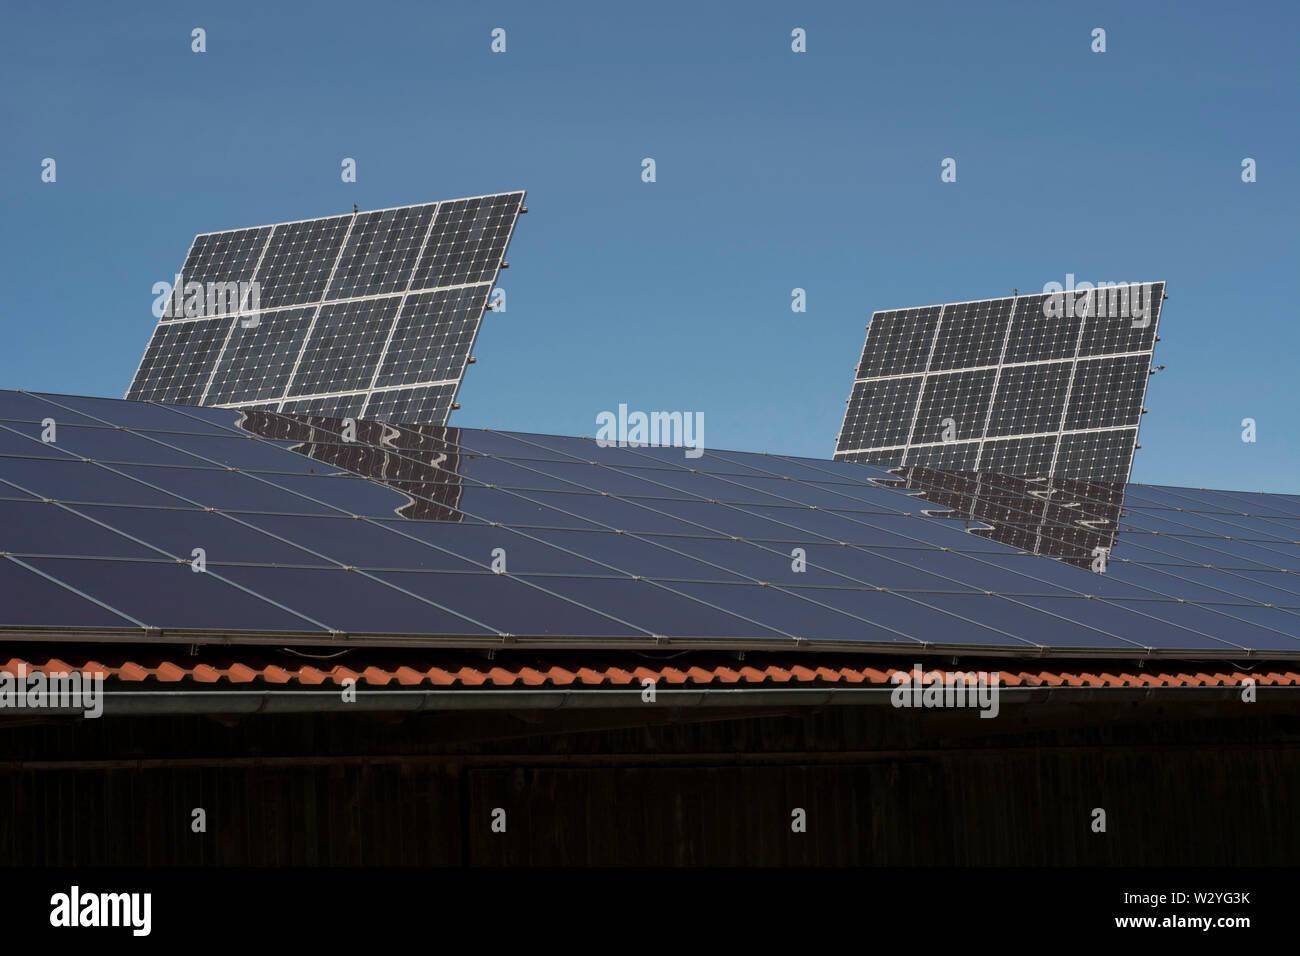 Pannelli solari, schwaebisch hall, michelfeld, Hohenlohe, Heilbronn-Franconia, BADEN-WUERTTEMBERG, Germania Foto Stock